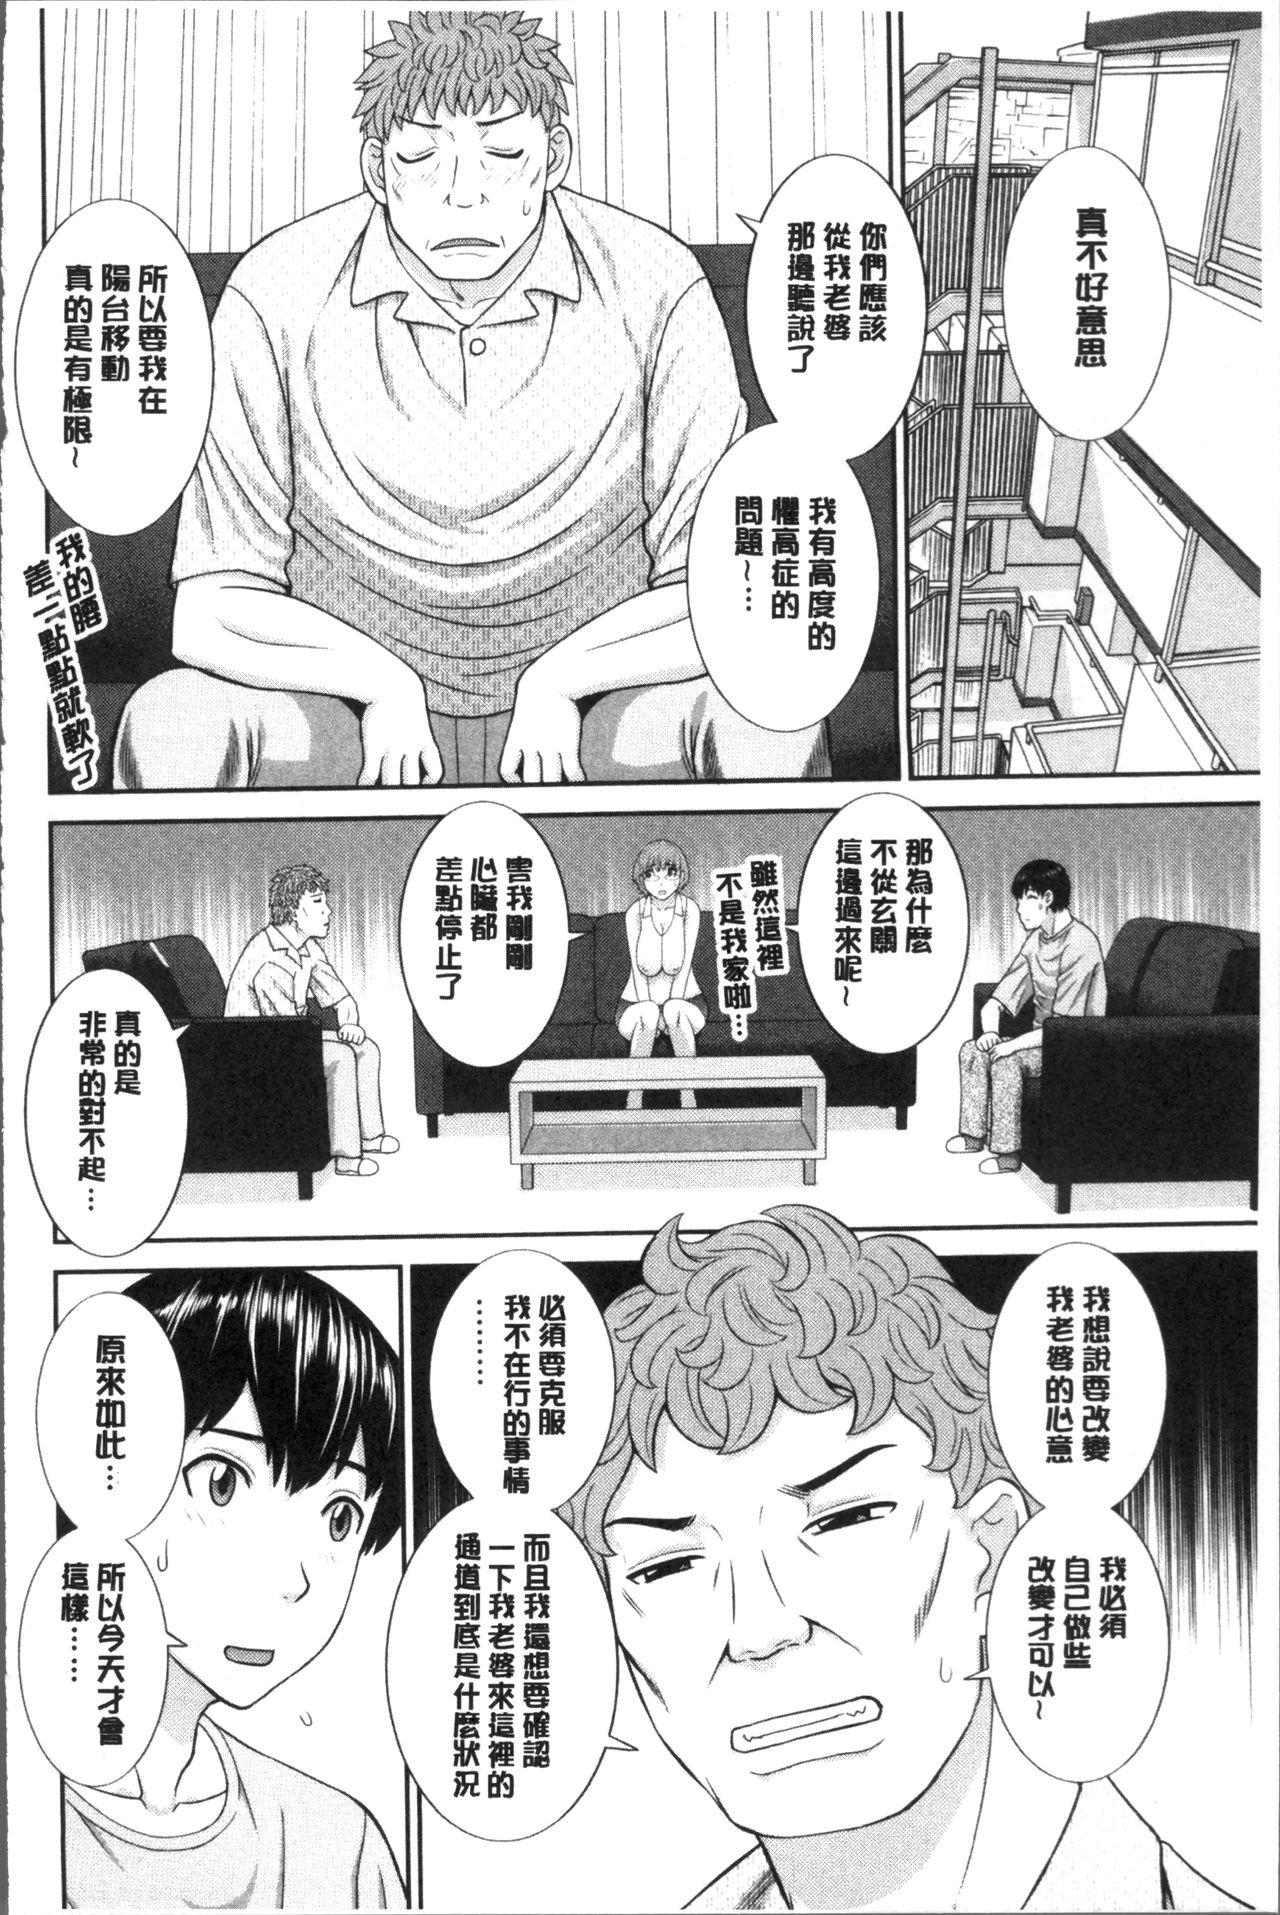 [Kawamori Misaki] Innyuu Shufu no Futei Ganbou - Oku-san to Kanojo to 2 | 淫乳主婦的不貞願望 和人妻也和女友❤2 [Chinese] 153